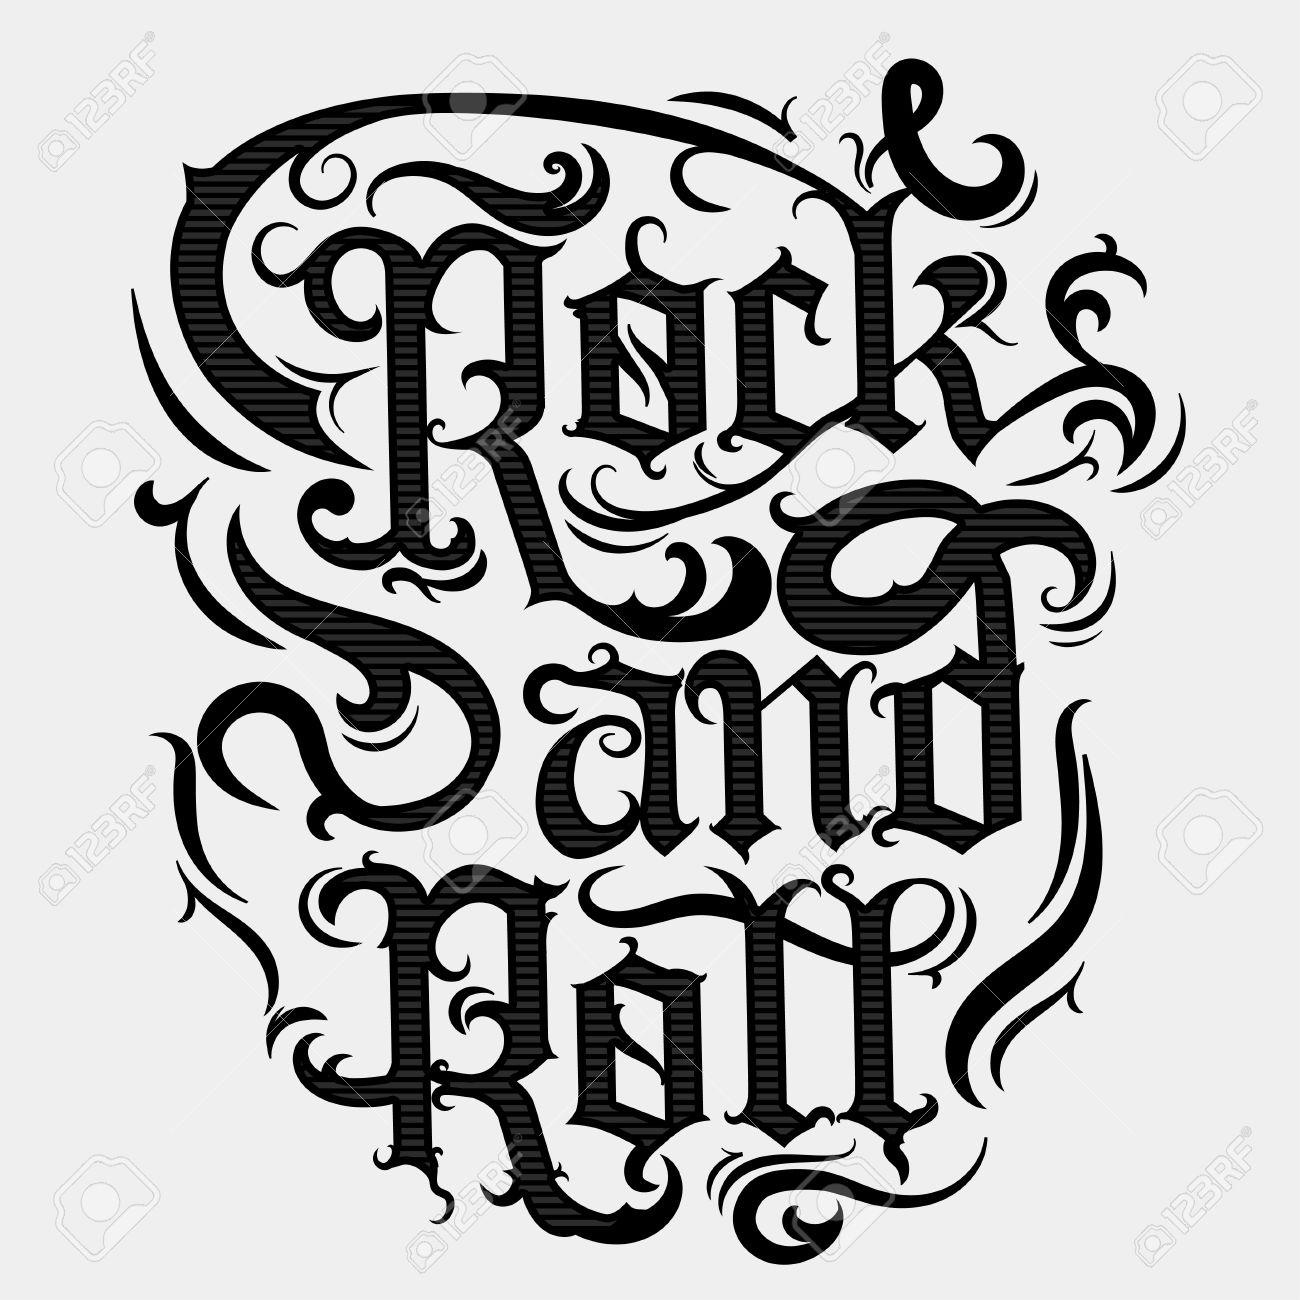 Rock n roll music print, vintage label, rock-music tee print stamp, vector graphic design. t-shirt print lettering artwork - 62134226